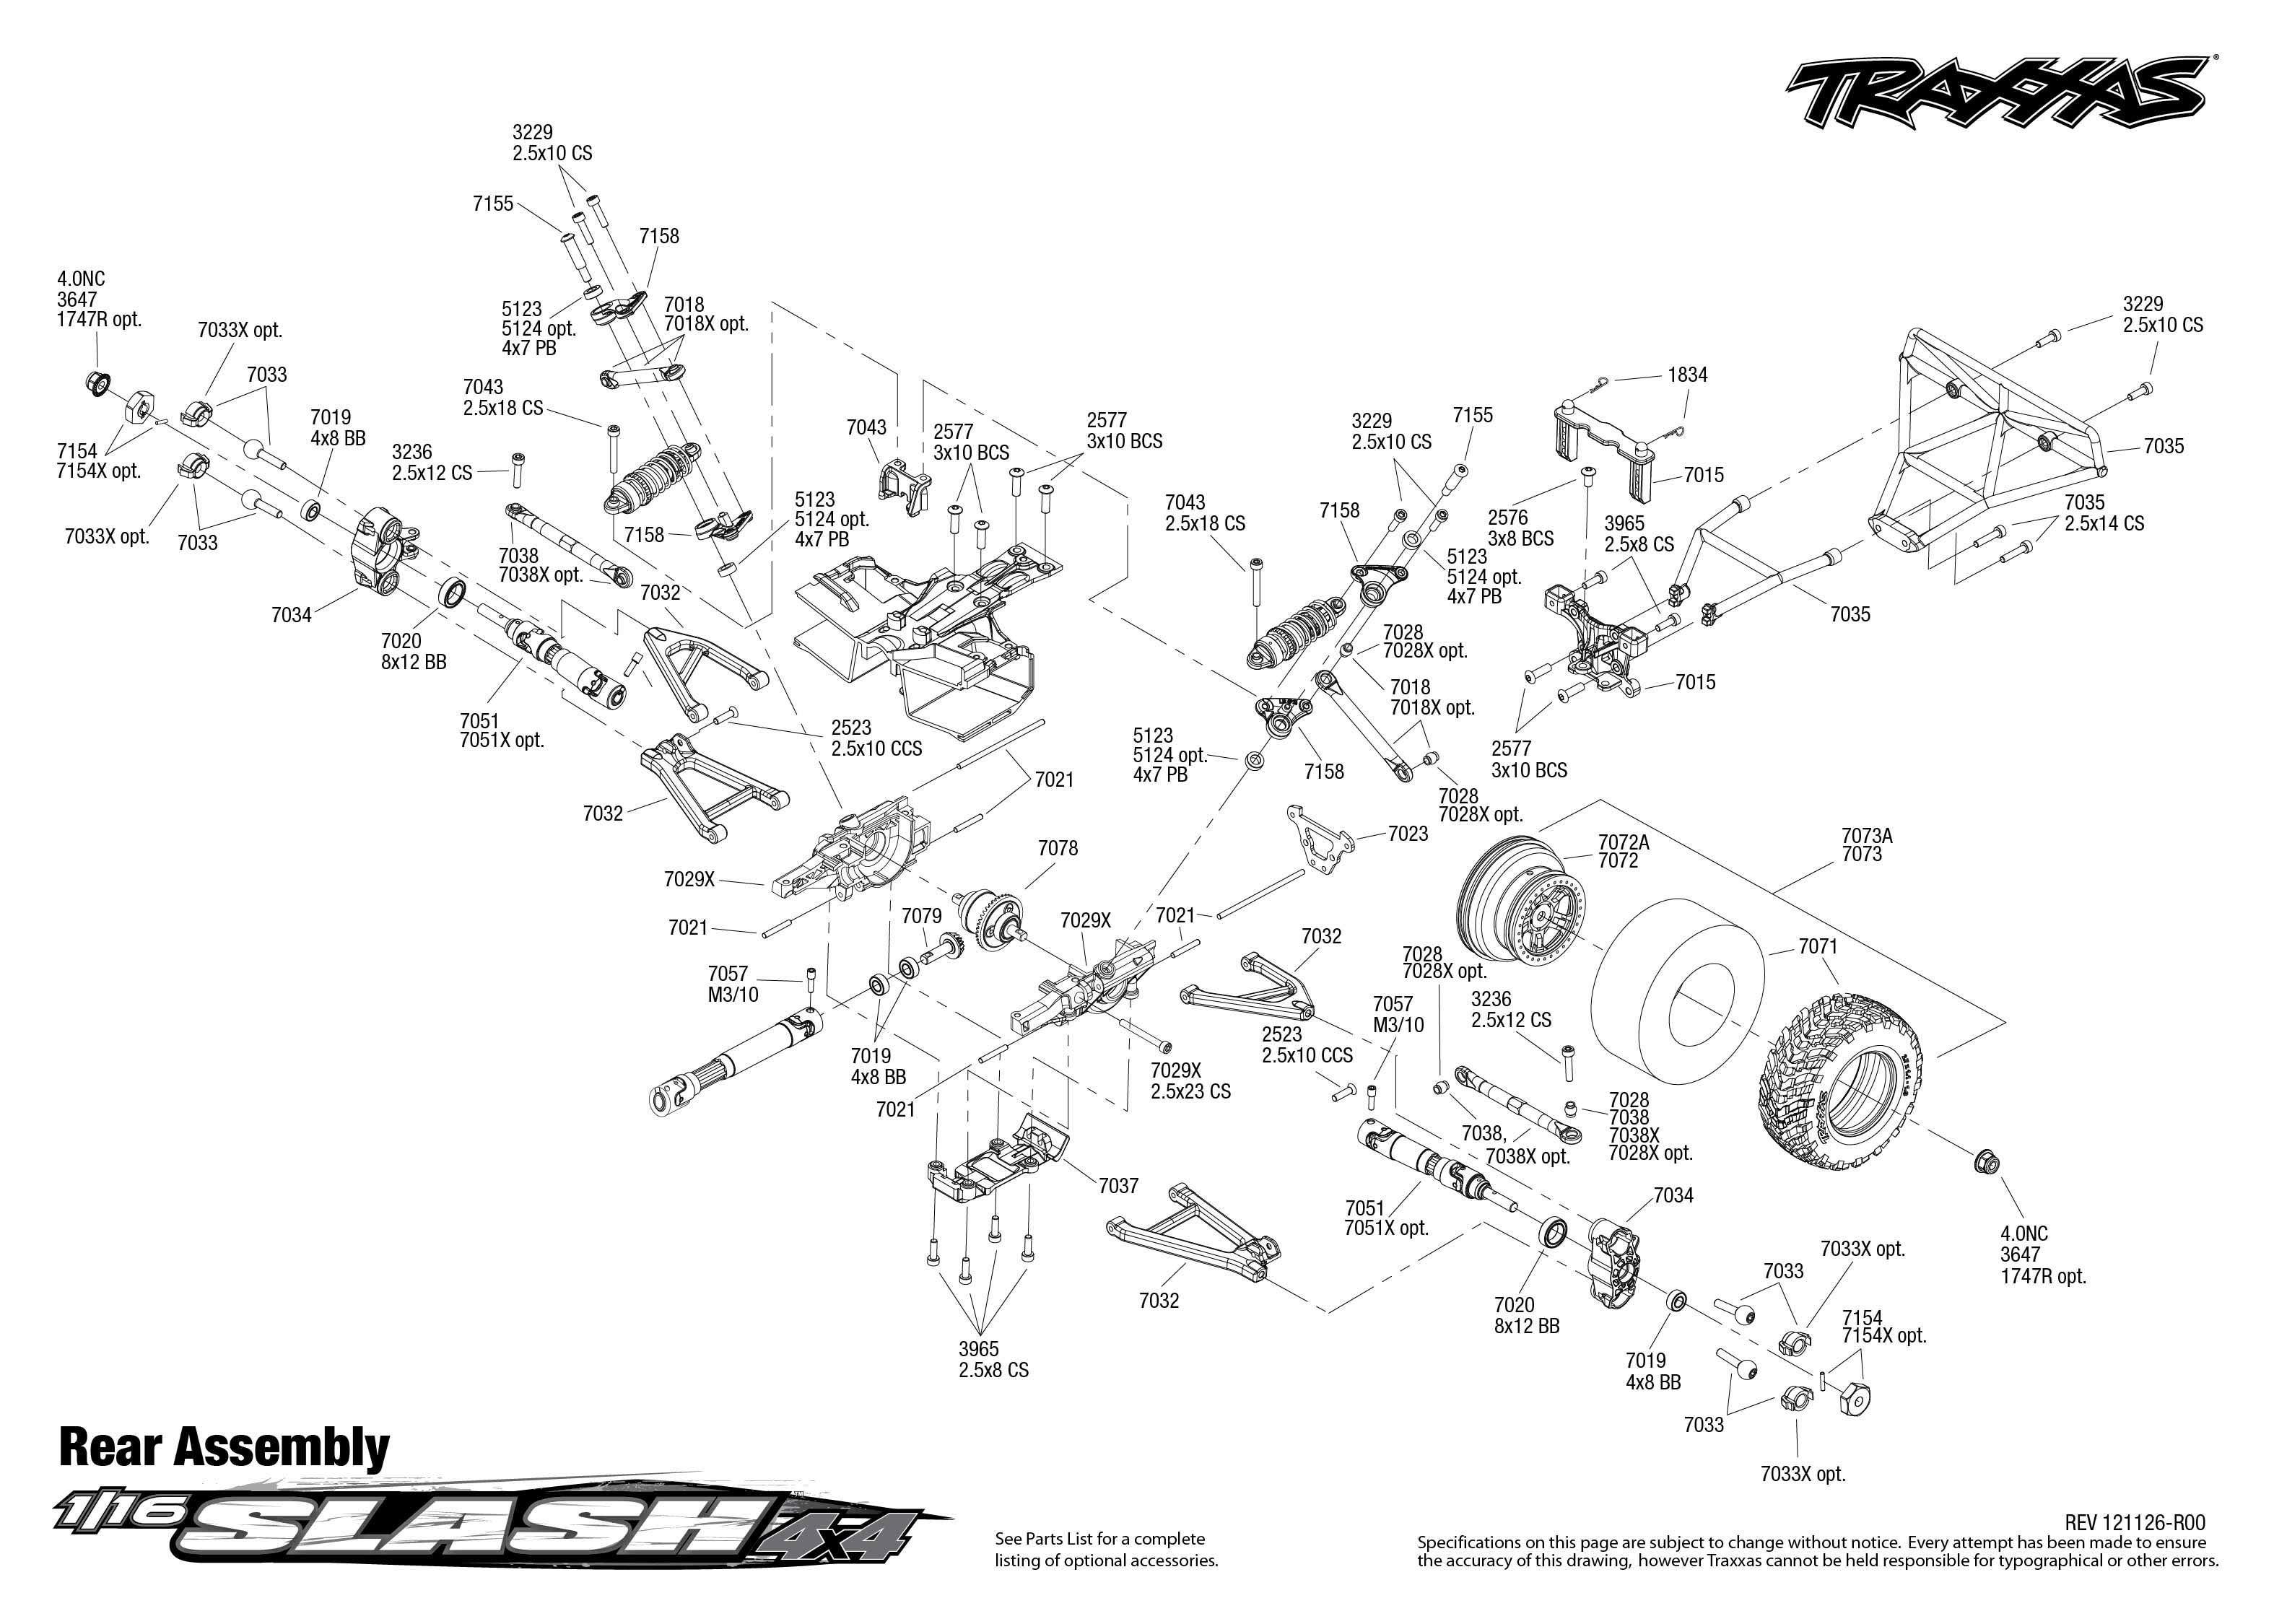 jato parts diagram wiring diagrams \u2022traxxas stampede 4x4 vxl parts  diagram traxxas get free traxxas